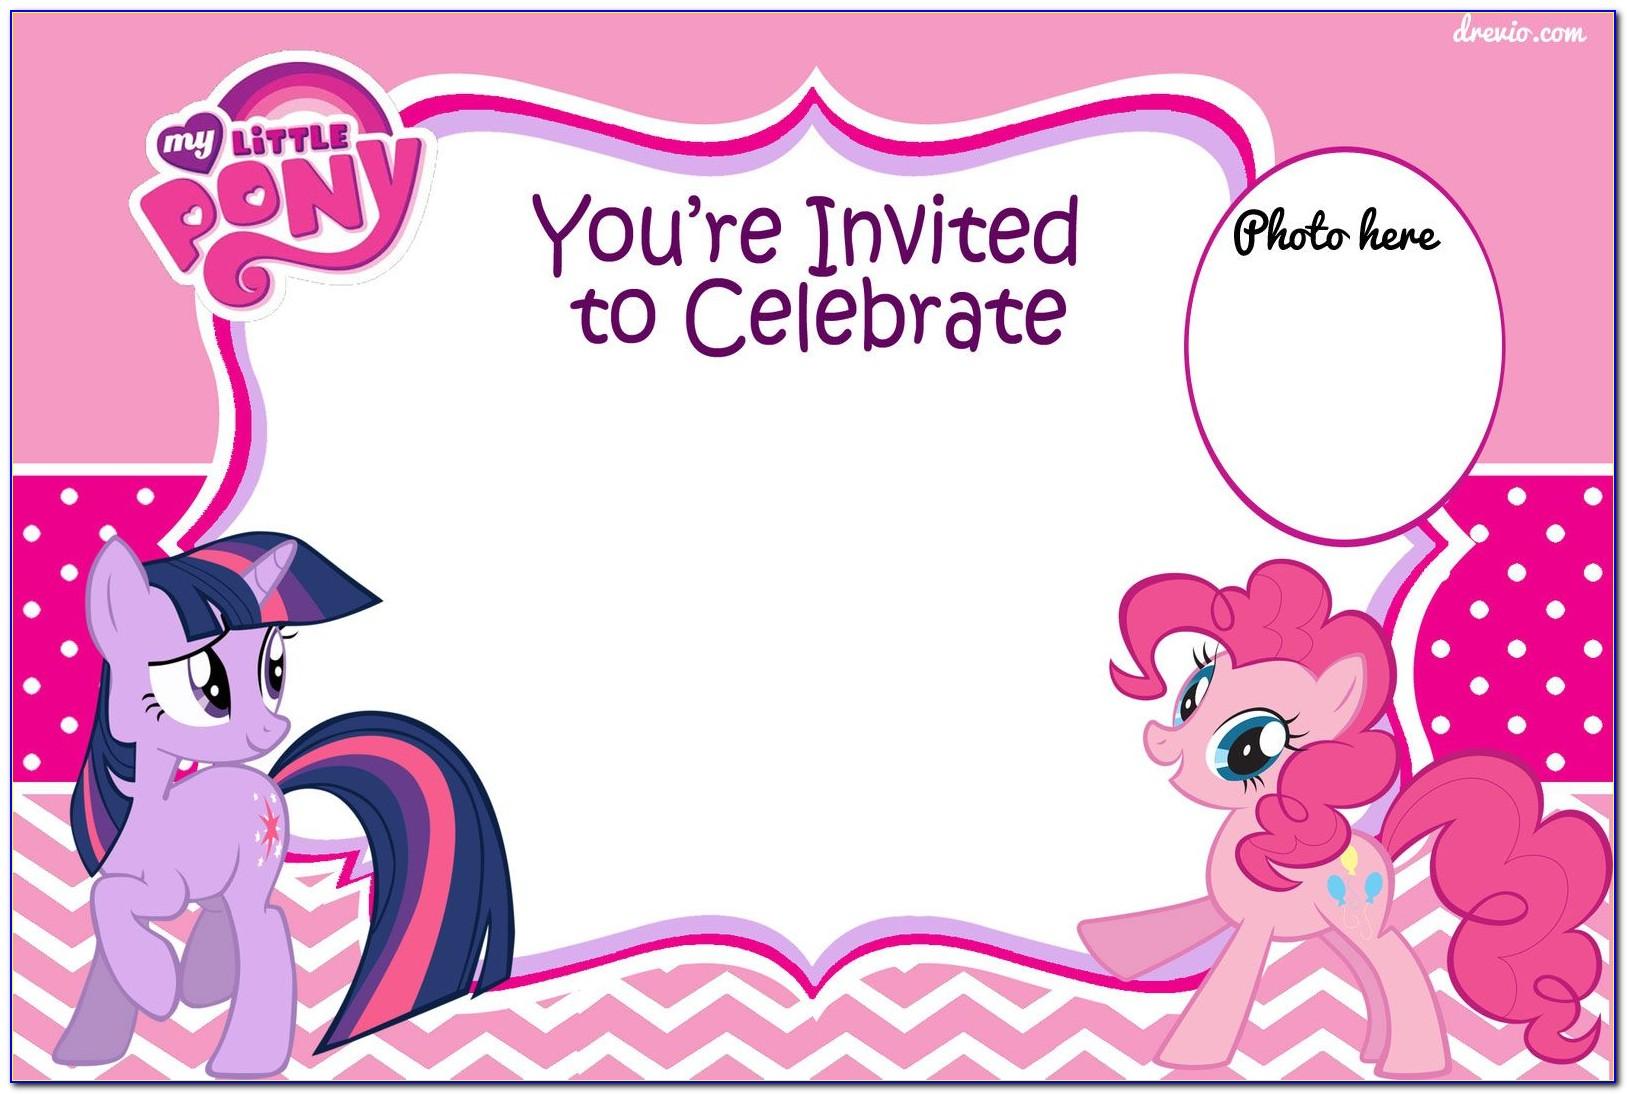 My Little Pony Birthday Invitation Cards